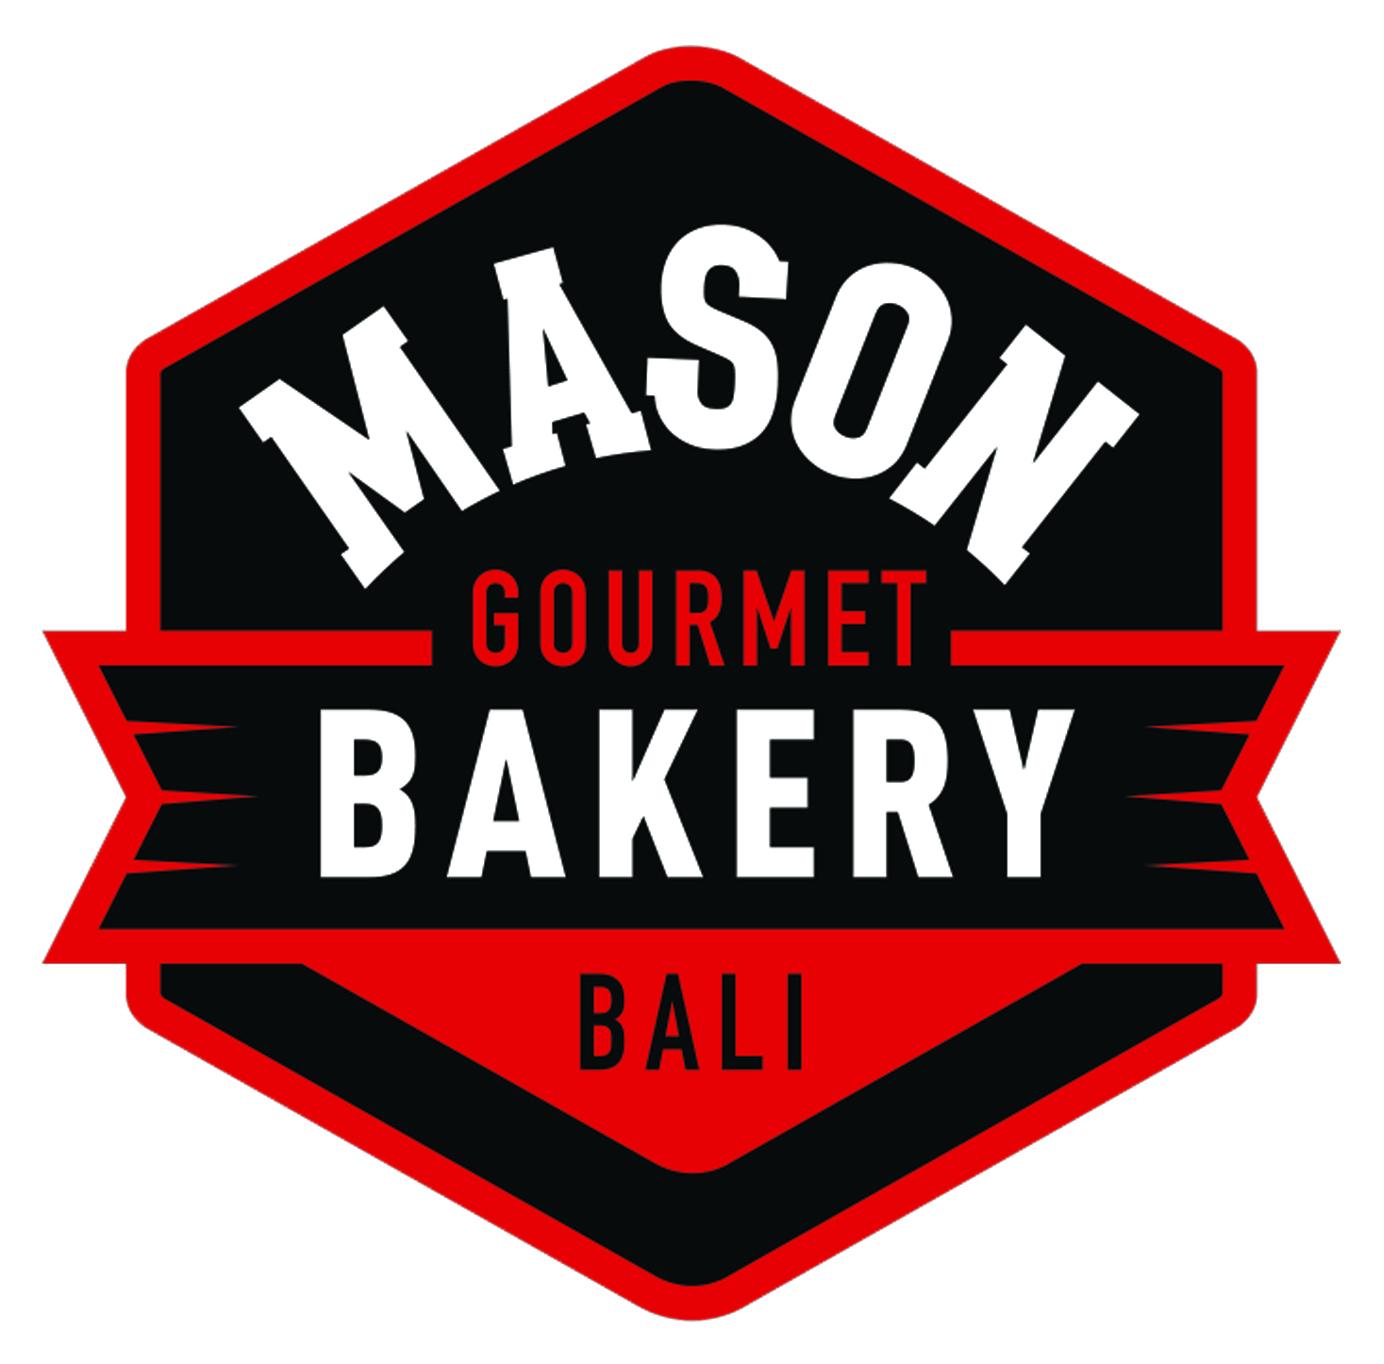 Mason Gourmet Bakery